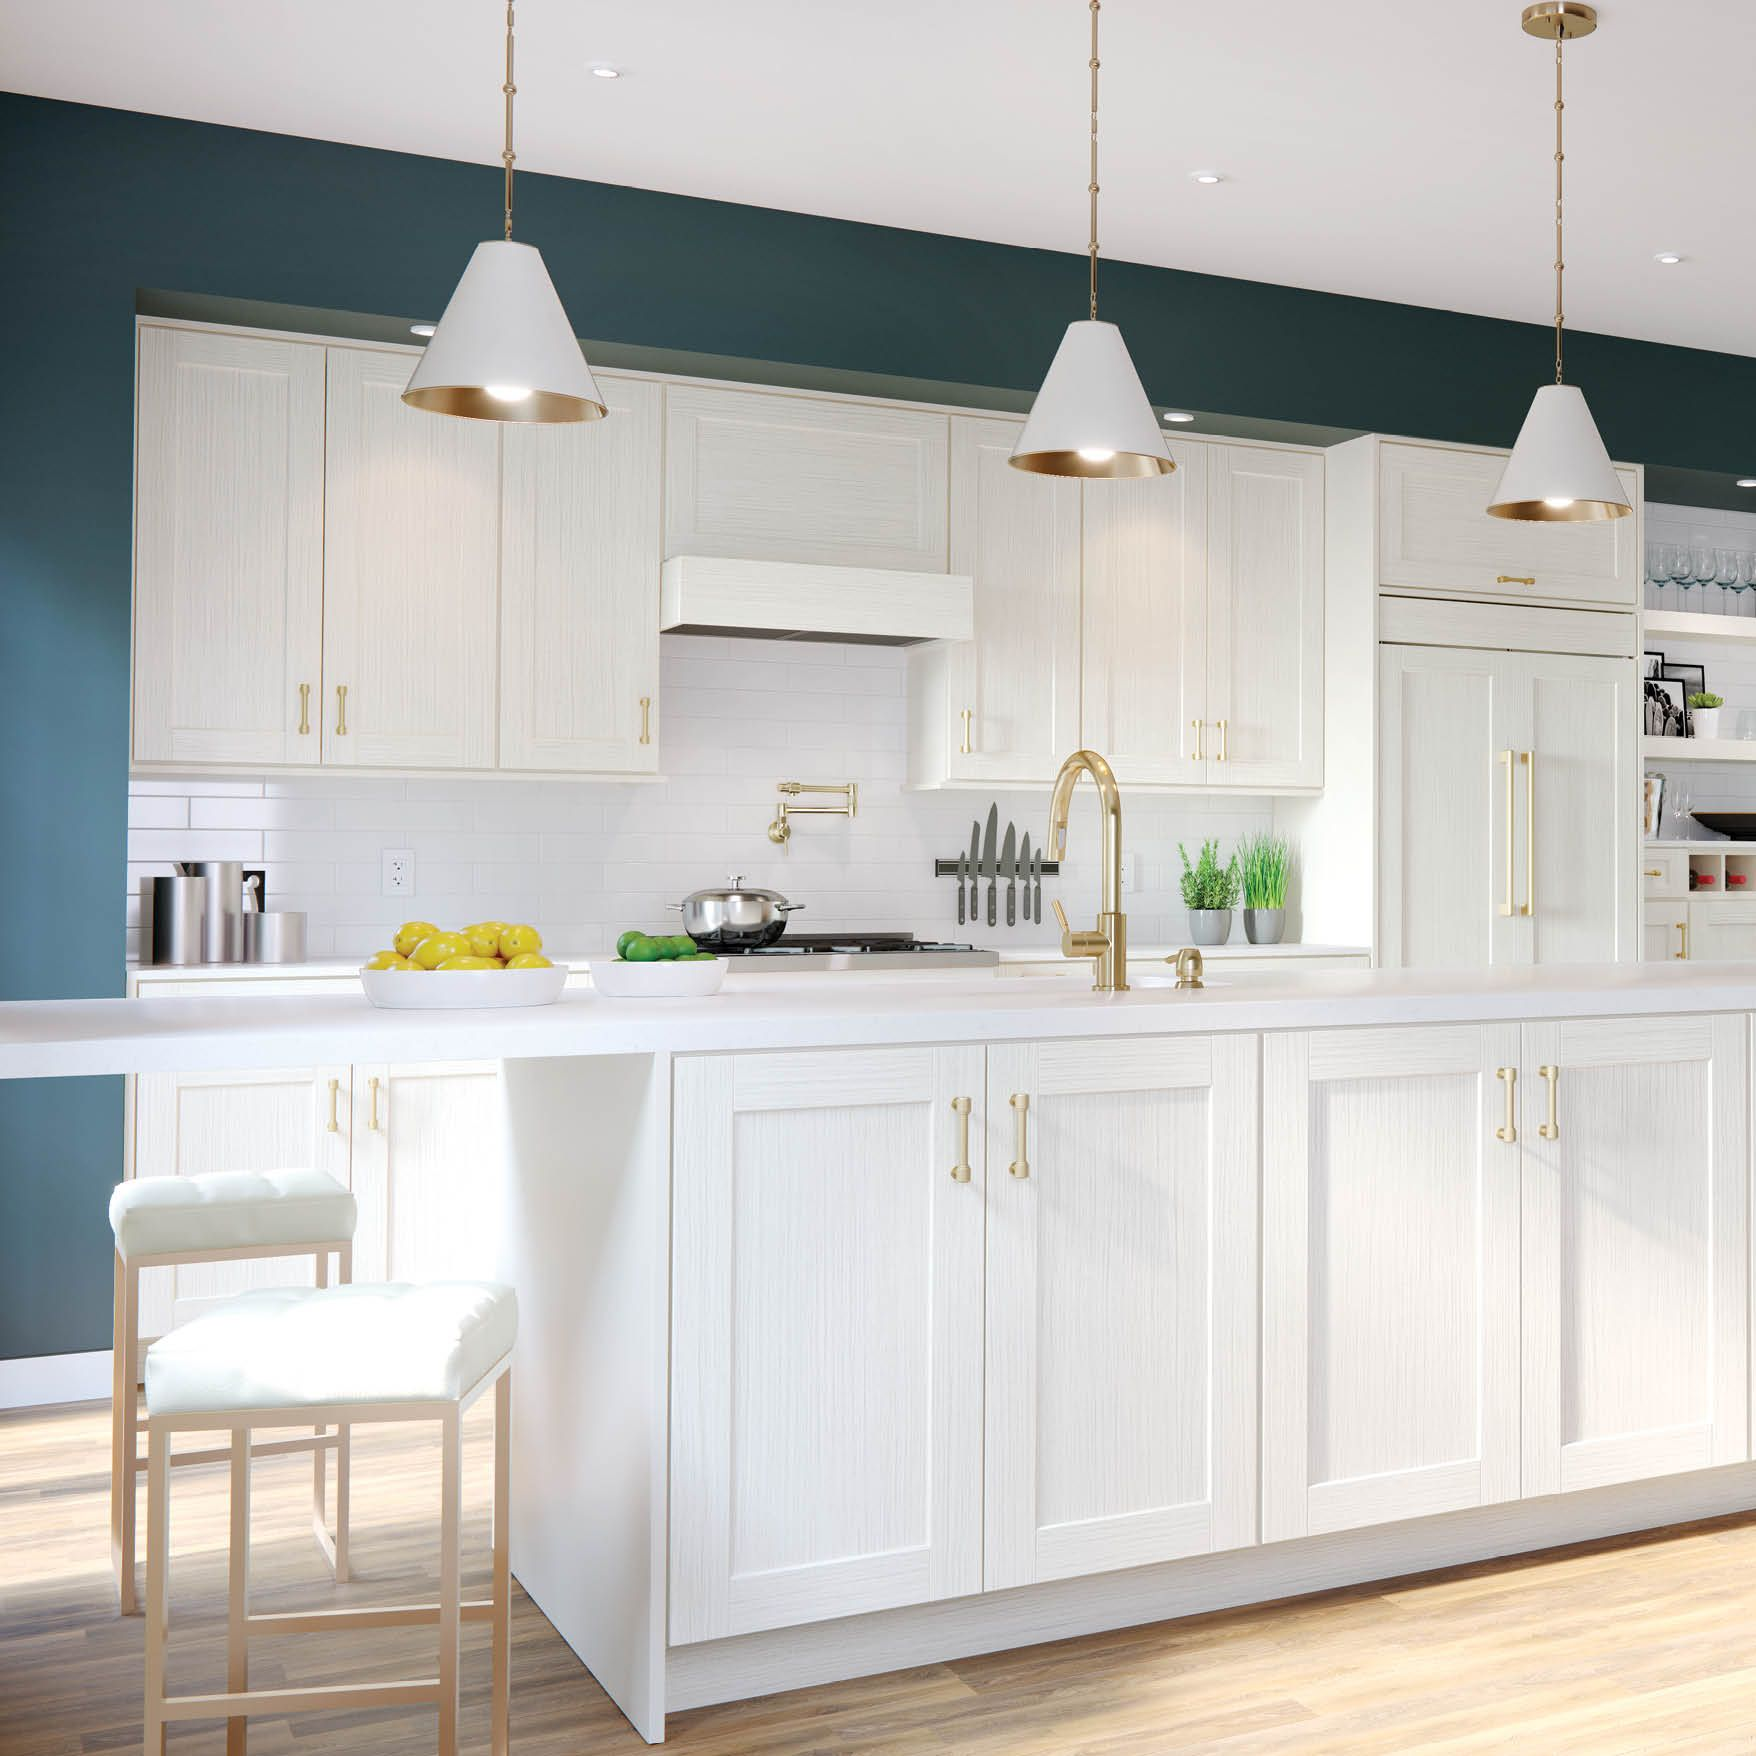 Best Beverage Bars Make Your Life A Breeze Kitchen Design 400 x 300